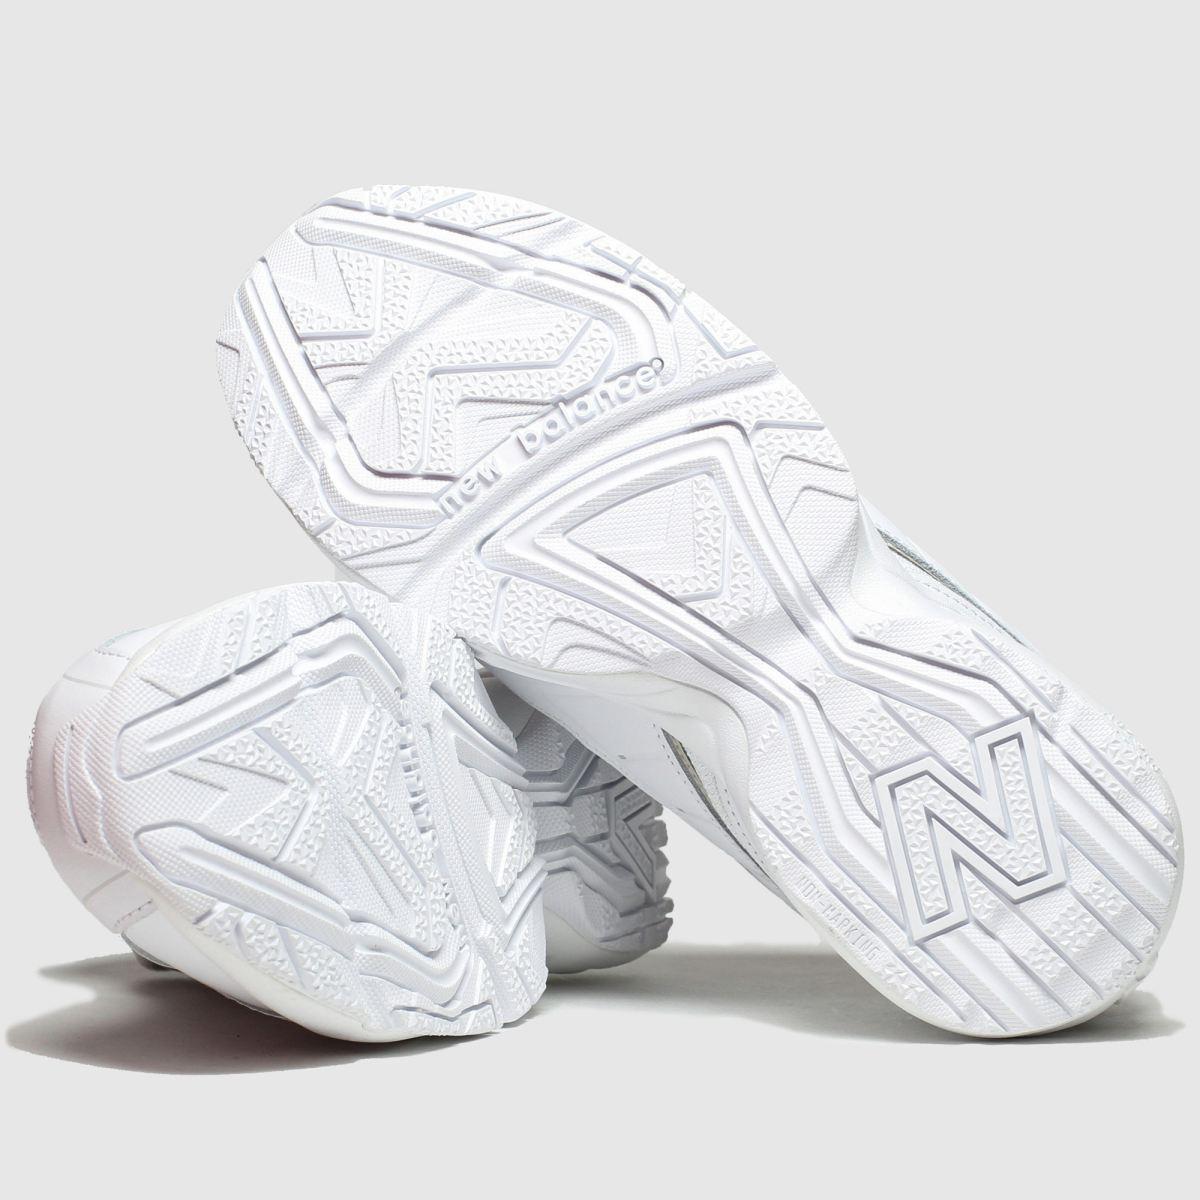 680cbd9247bf8 womens white & grey new balance 452 trainers   schuh